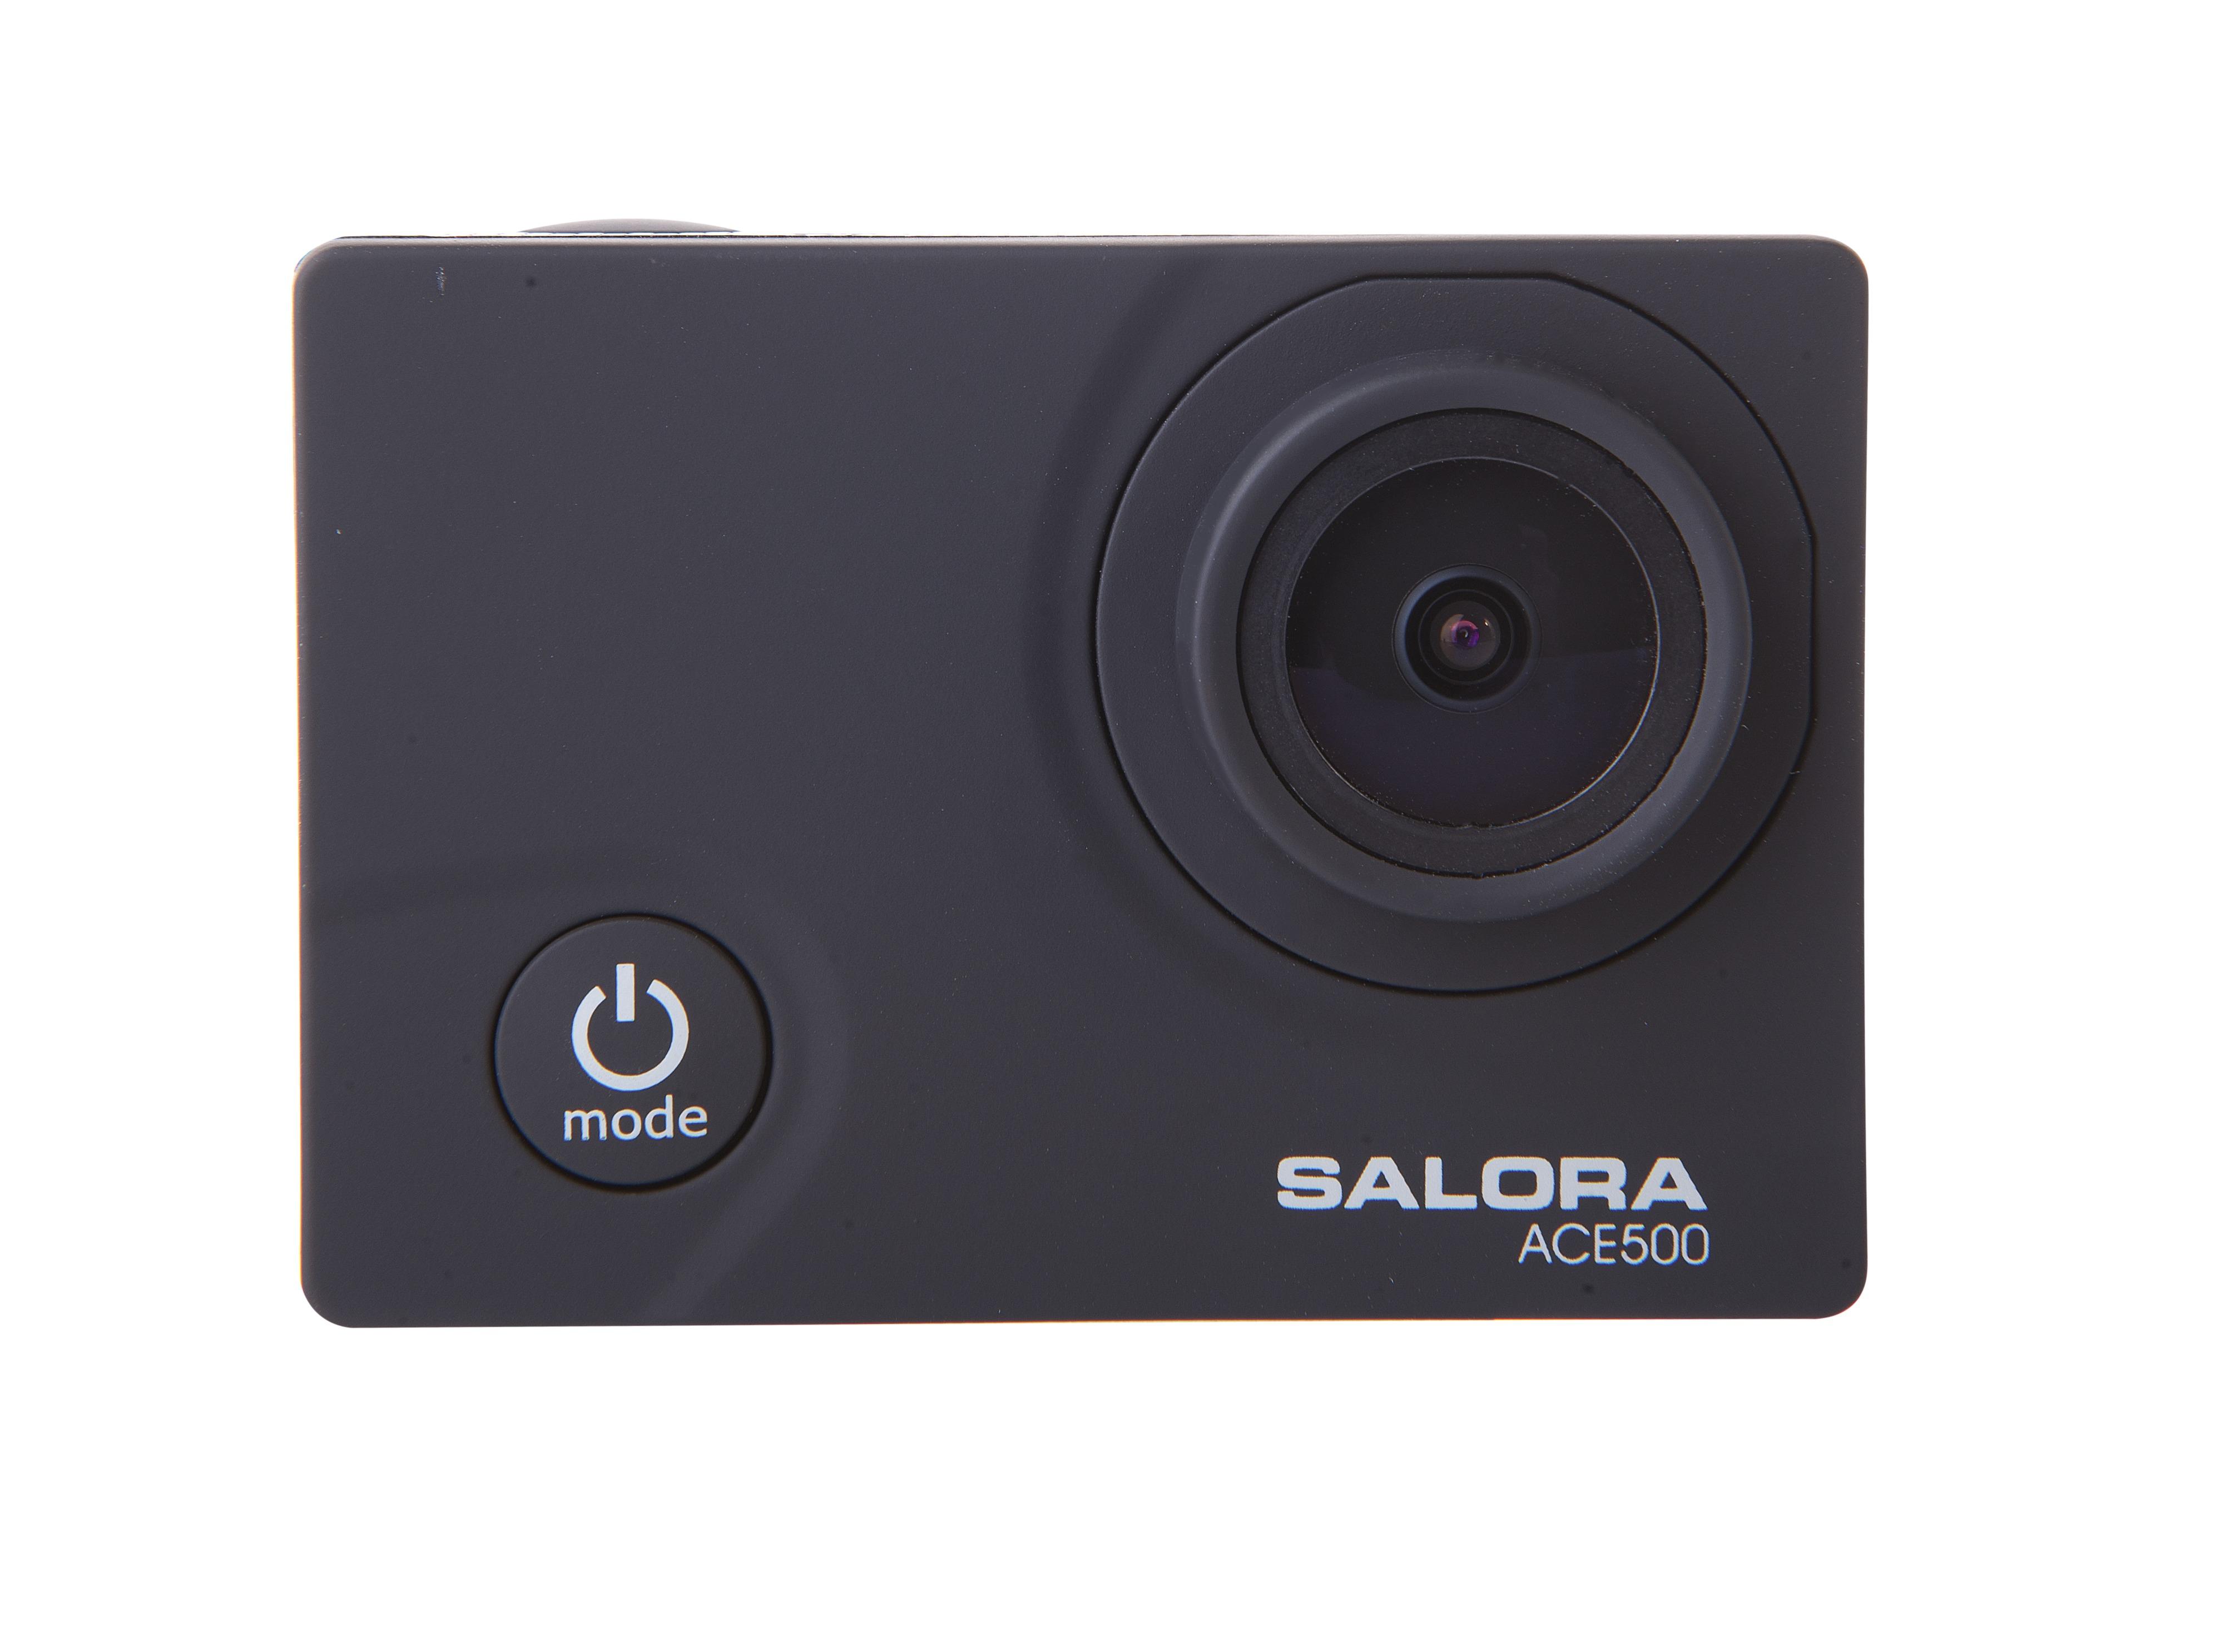 Korting Salora ACE500 actioncam